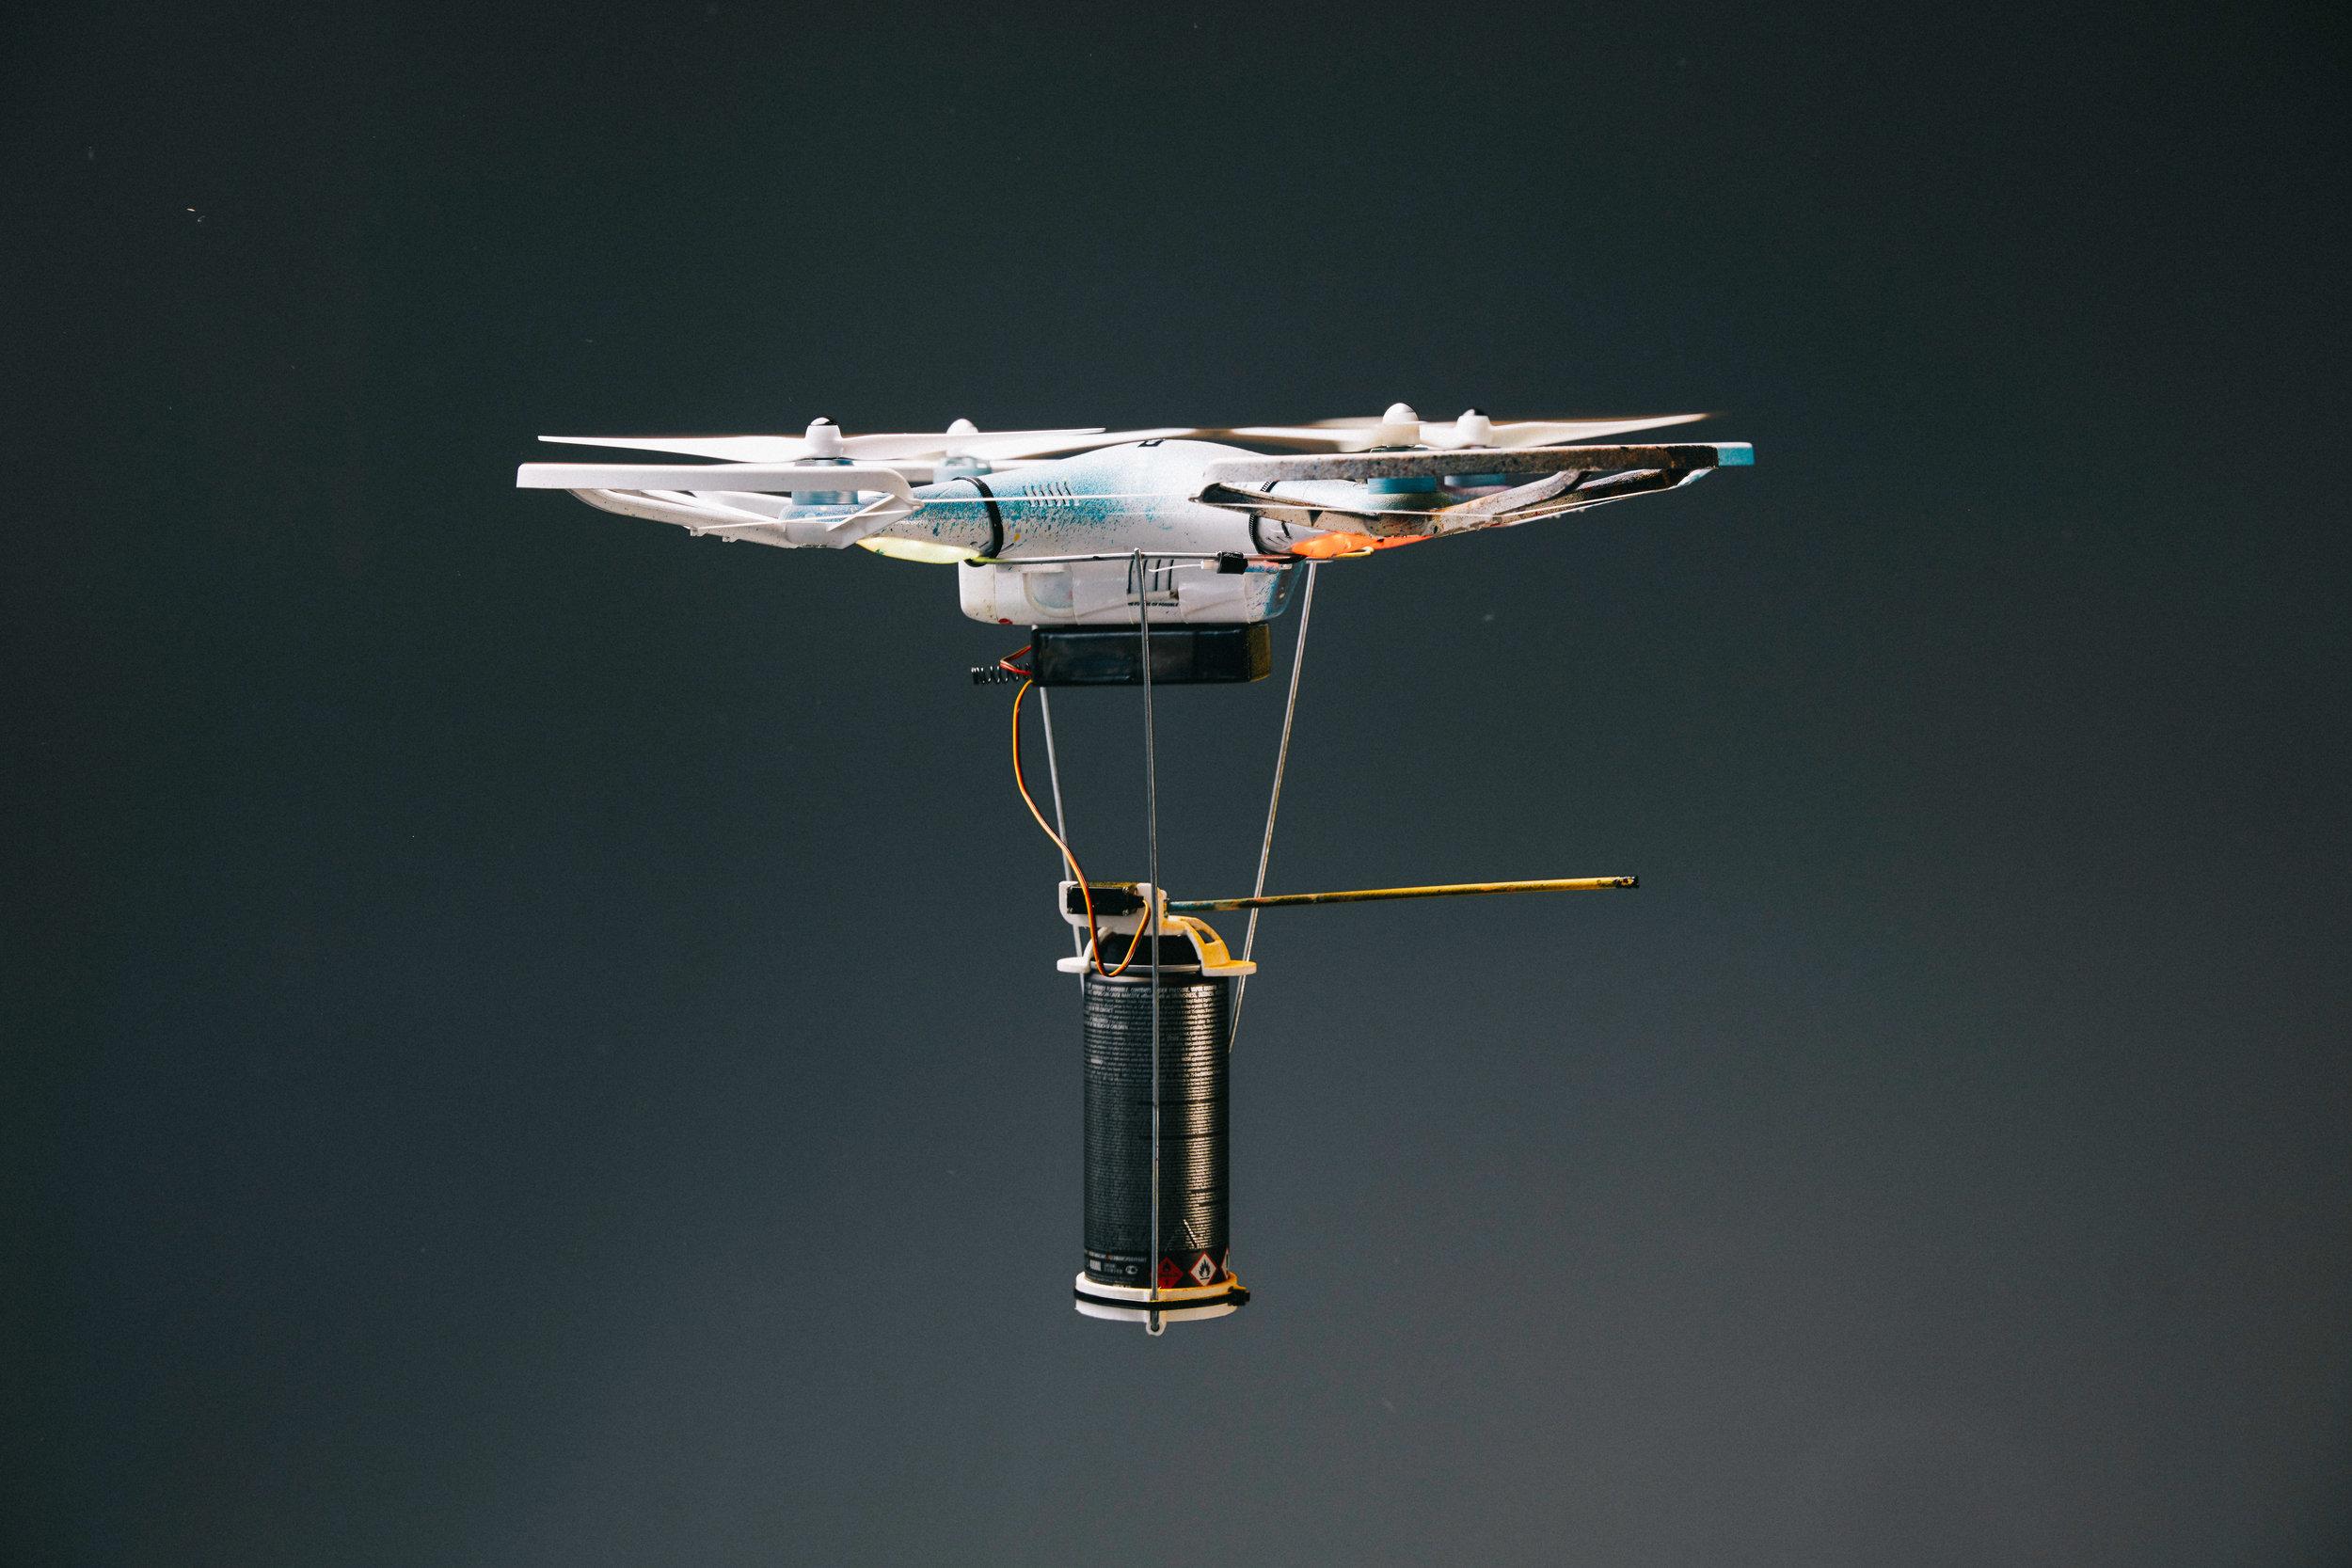 DRONE-7159.jpg